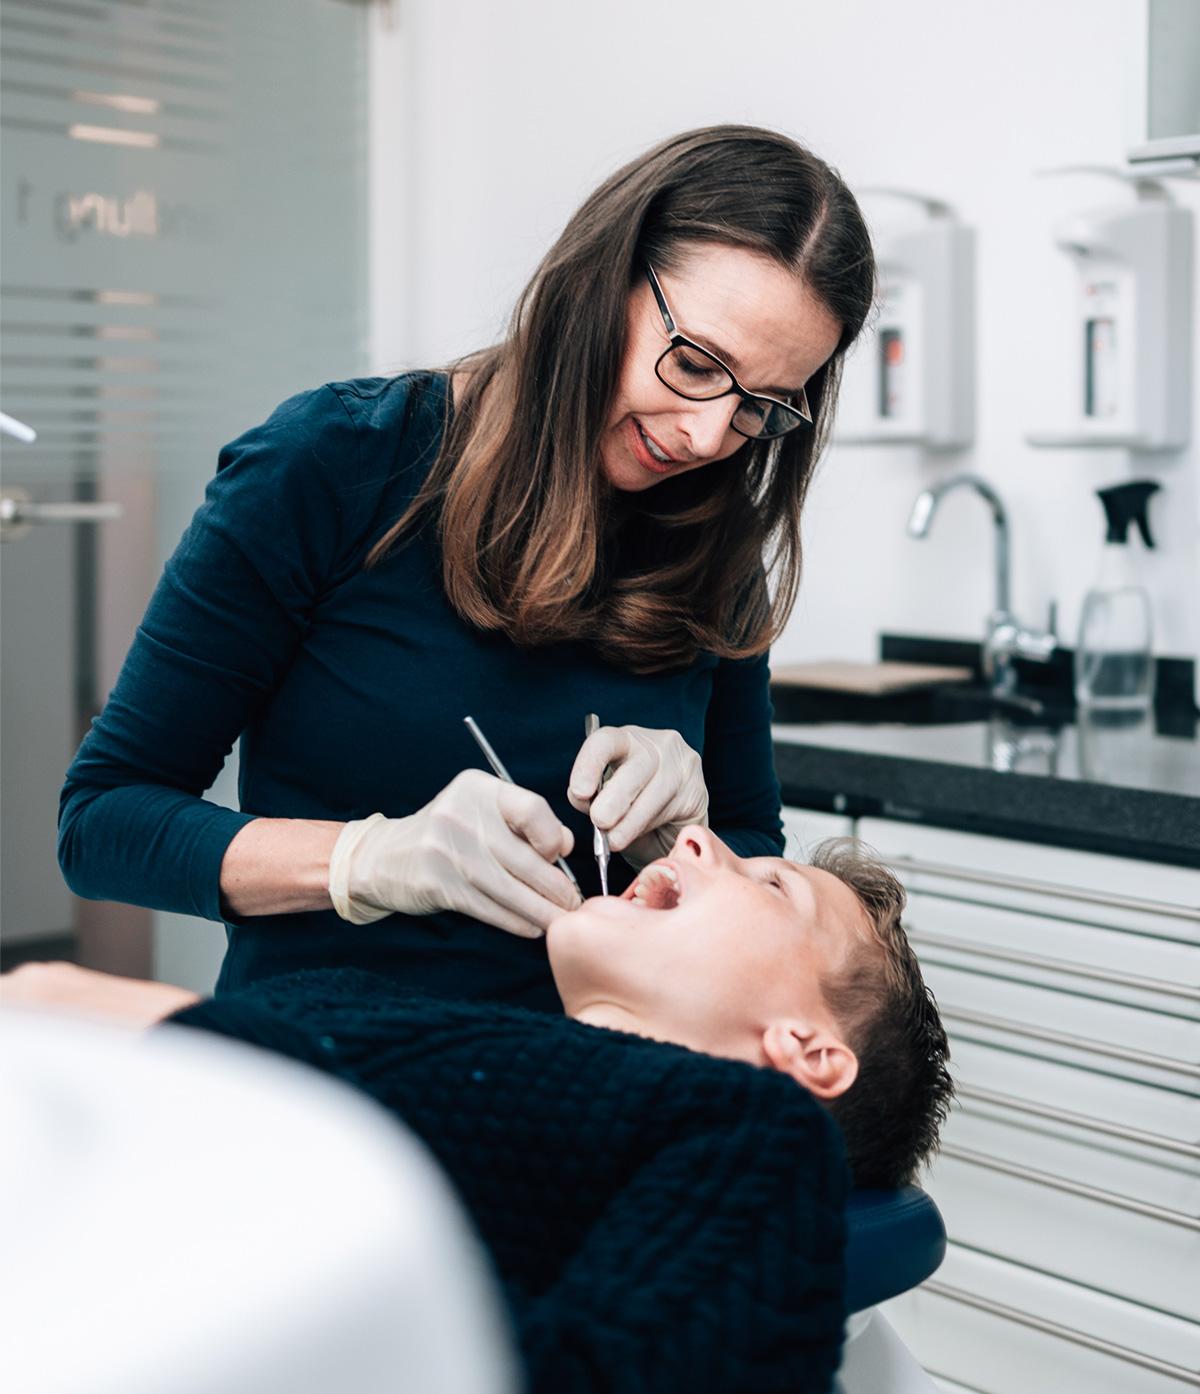 Zahnärzte Kuhnke Bassenheim - Dr. Almuth Kuhnke